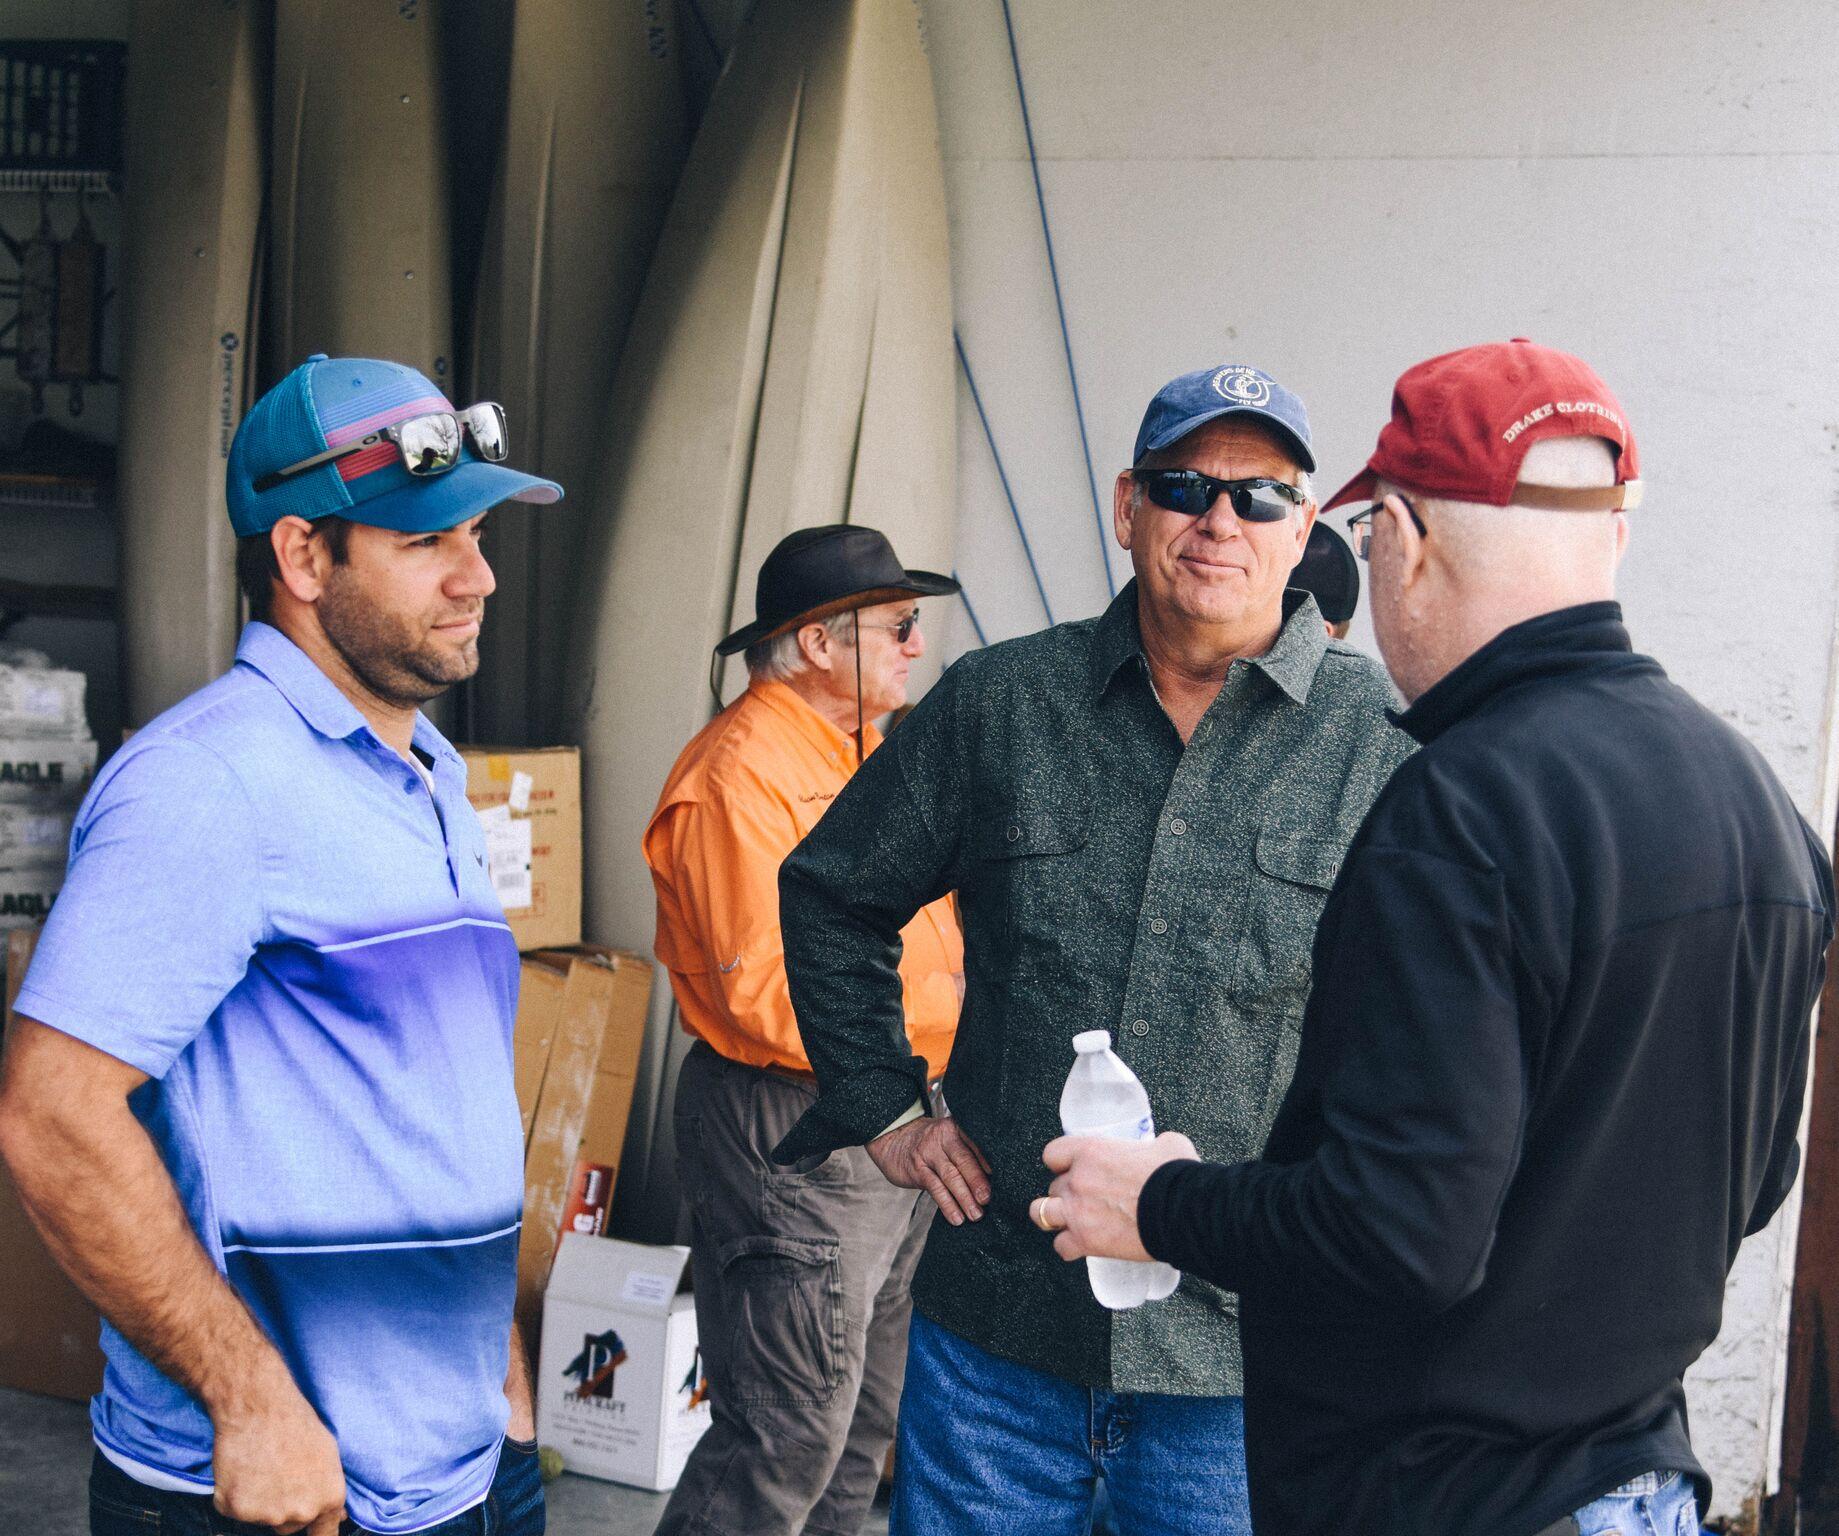 Grant talking with Texas/Oklahoma hunters